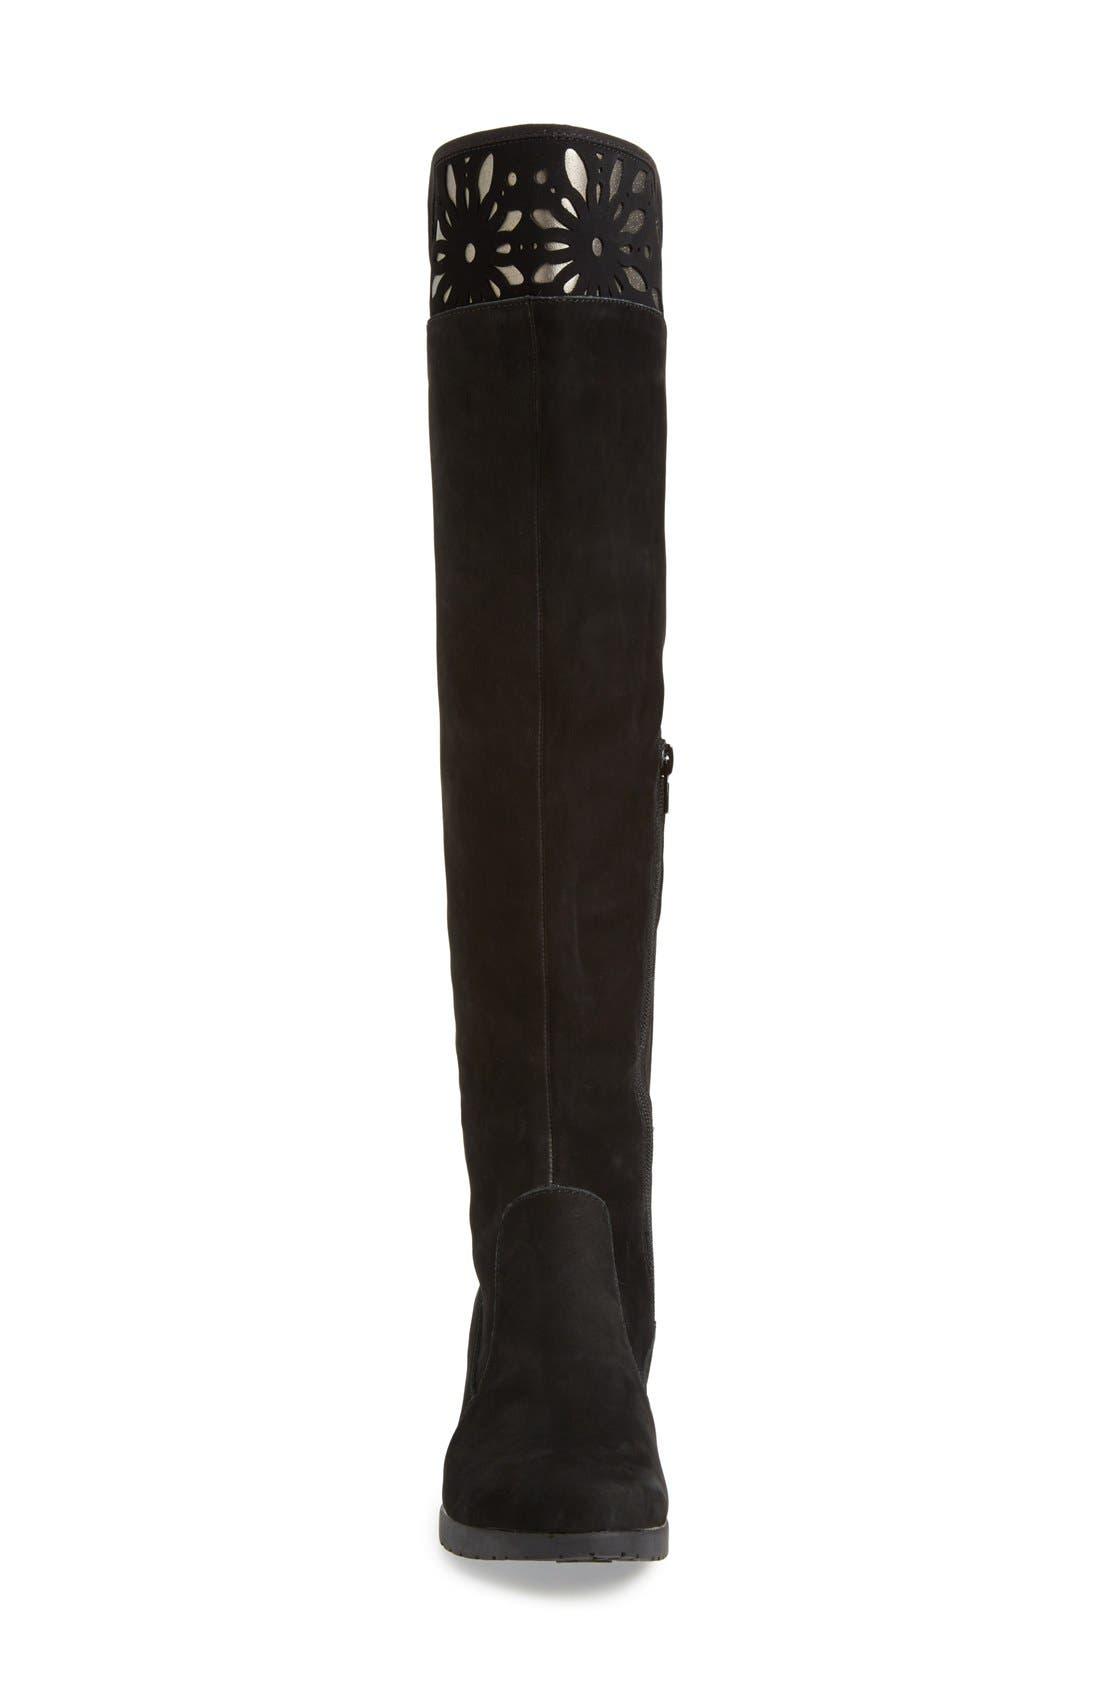 Alternate Image 3  - Jambu'Natalia' CutoutDetail Water ResistantOver the Knee Boot (Women)